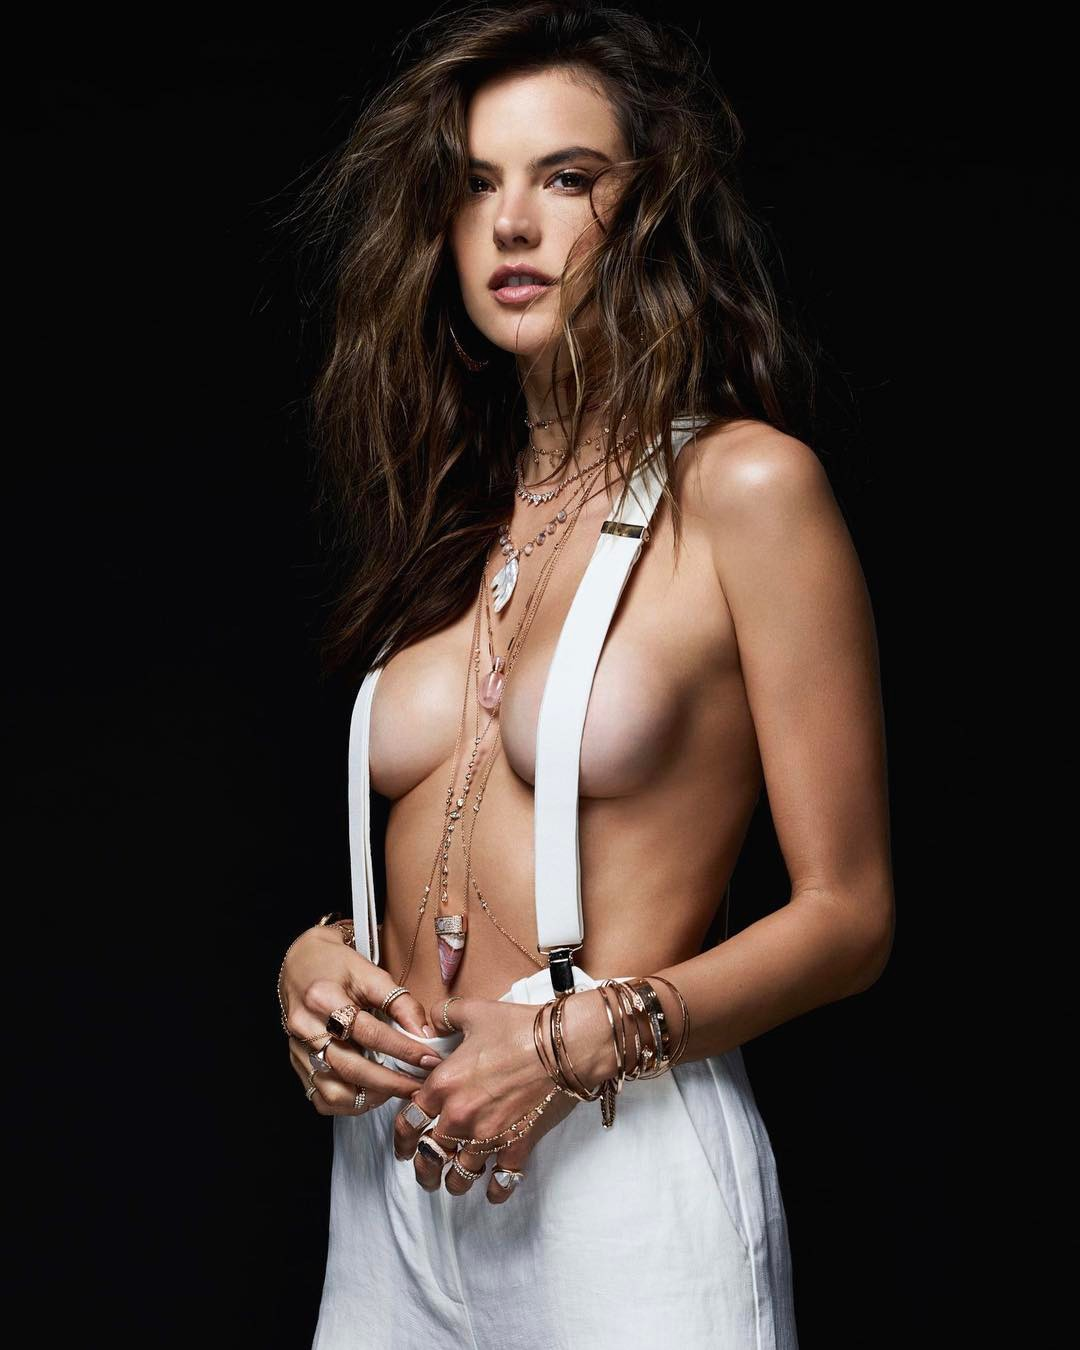 Alessandra ambrosio sex free sex videos watch beautiful